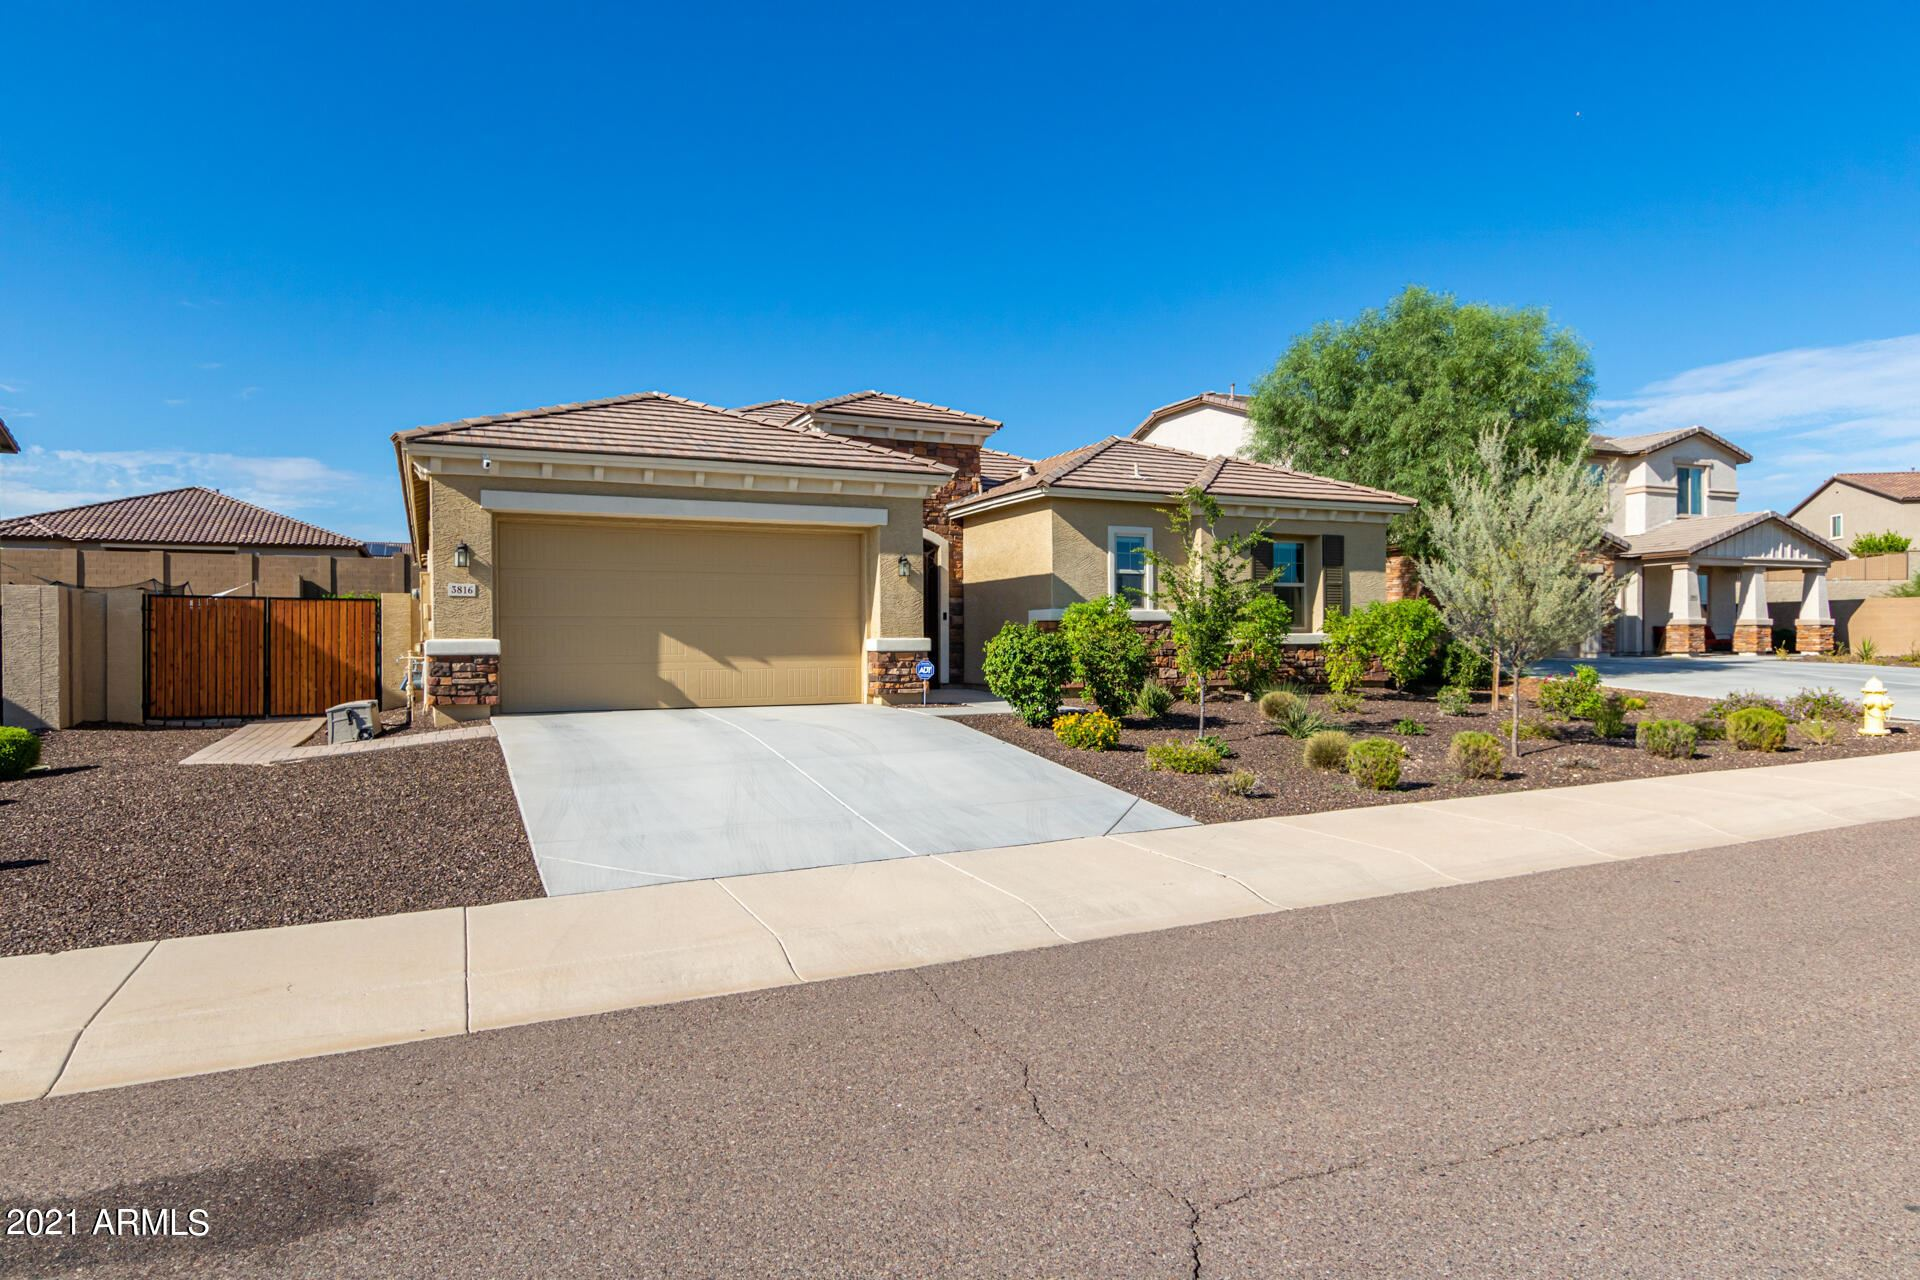 Photo of 3816 W Brogan Court, New River, AZ 85087 (MLS # 6286849)